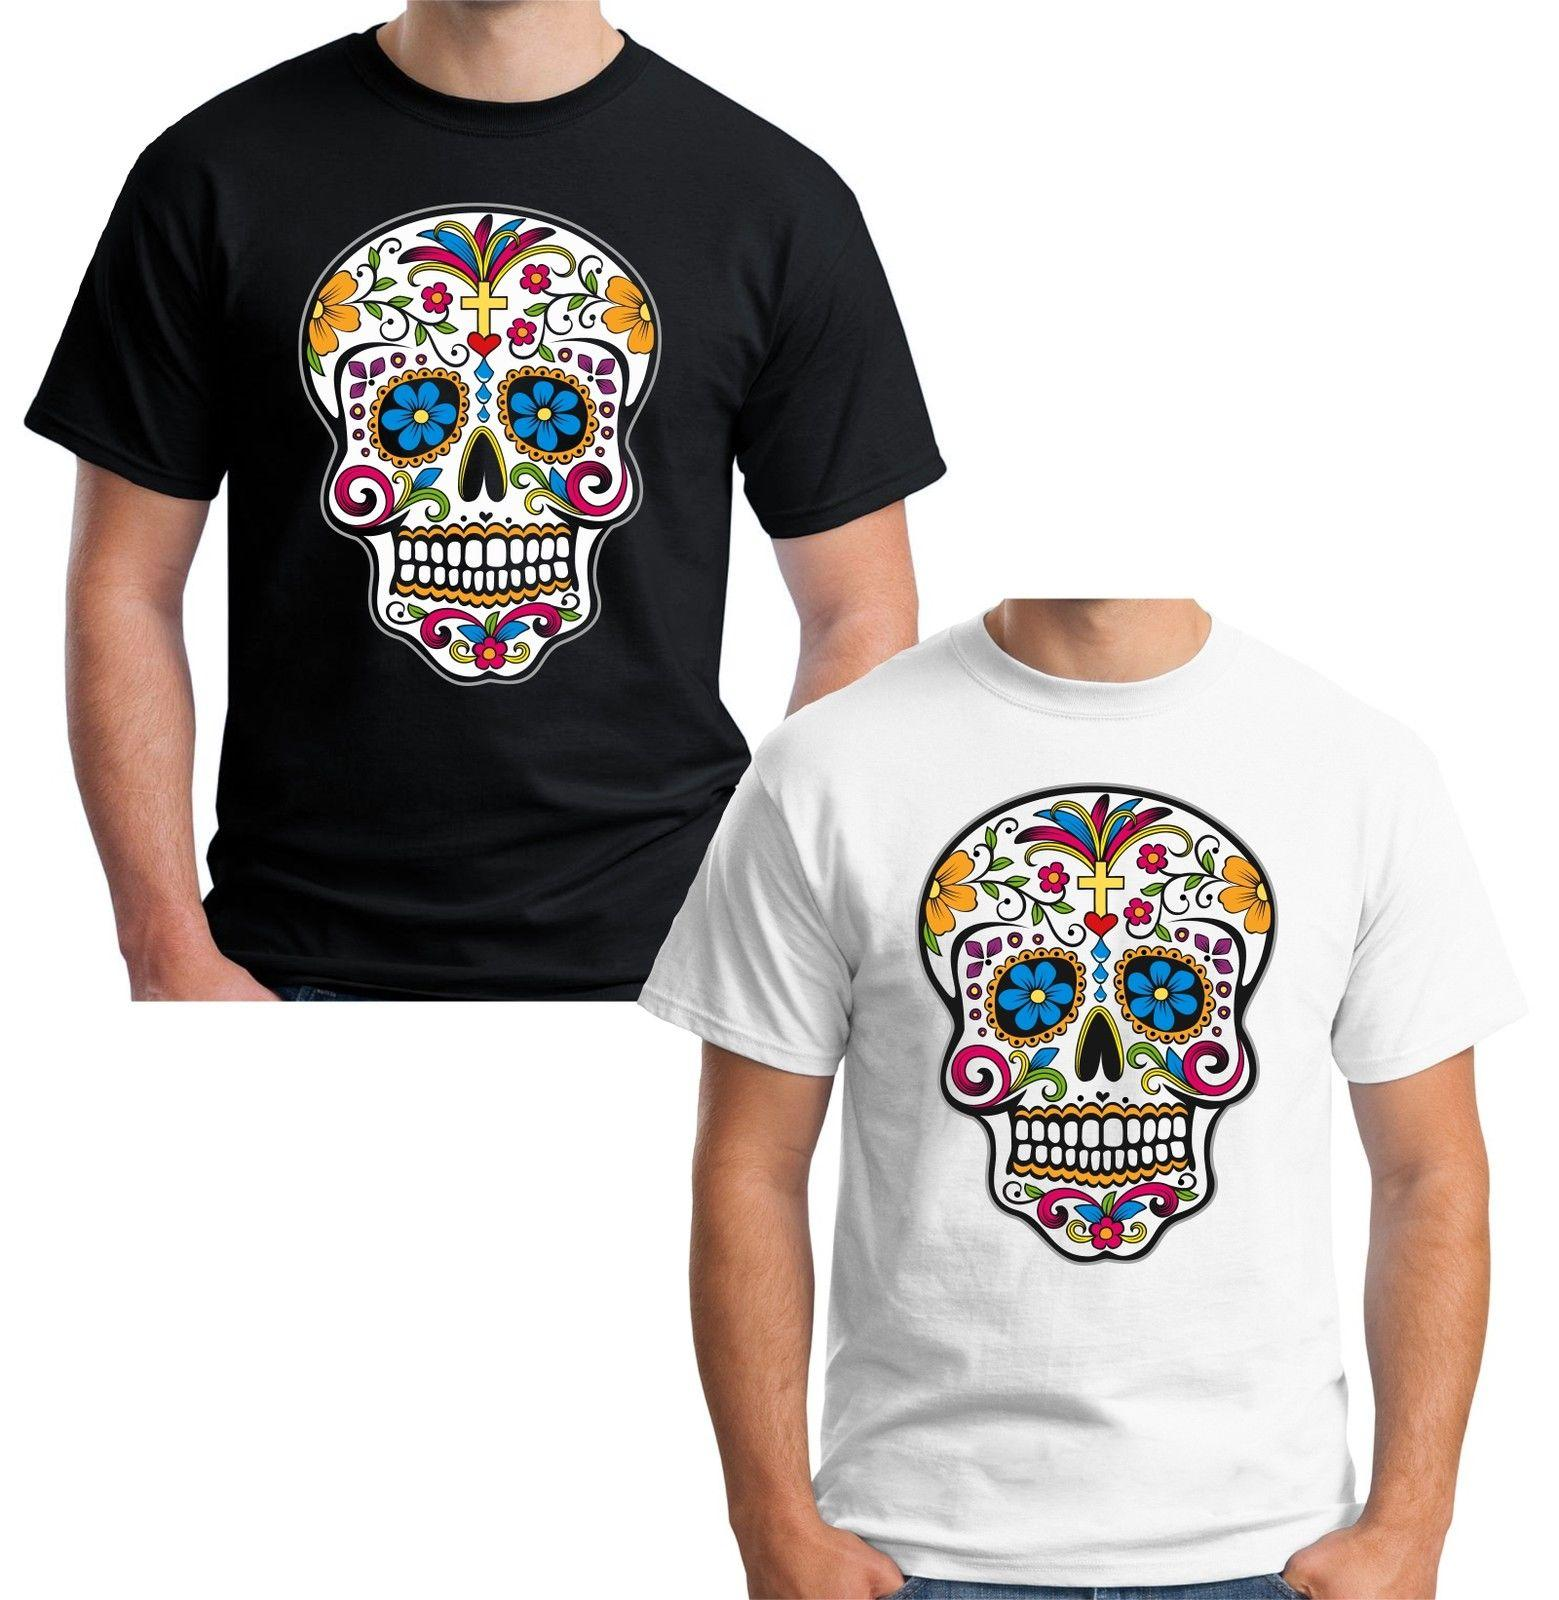 ca25ed585 Velocitee Mens Sugar Skull T Shirt Tattoo Style Dia De Los Muertos V164  Online with $13.15/Piece on Beidhgate03's Store | DHgate.com